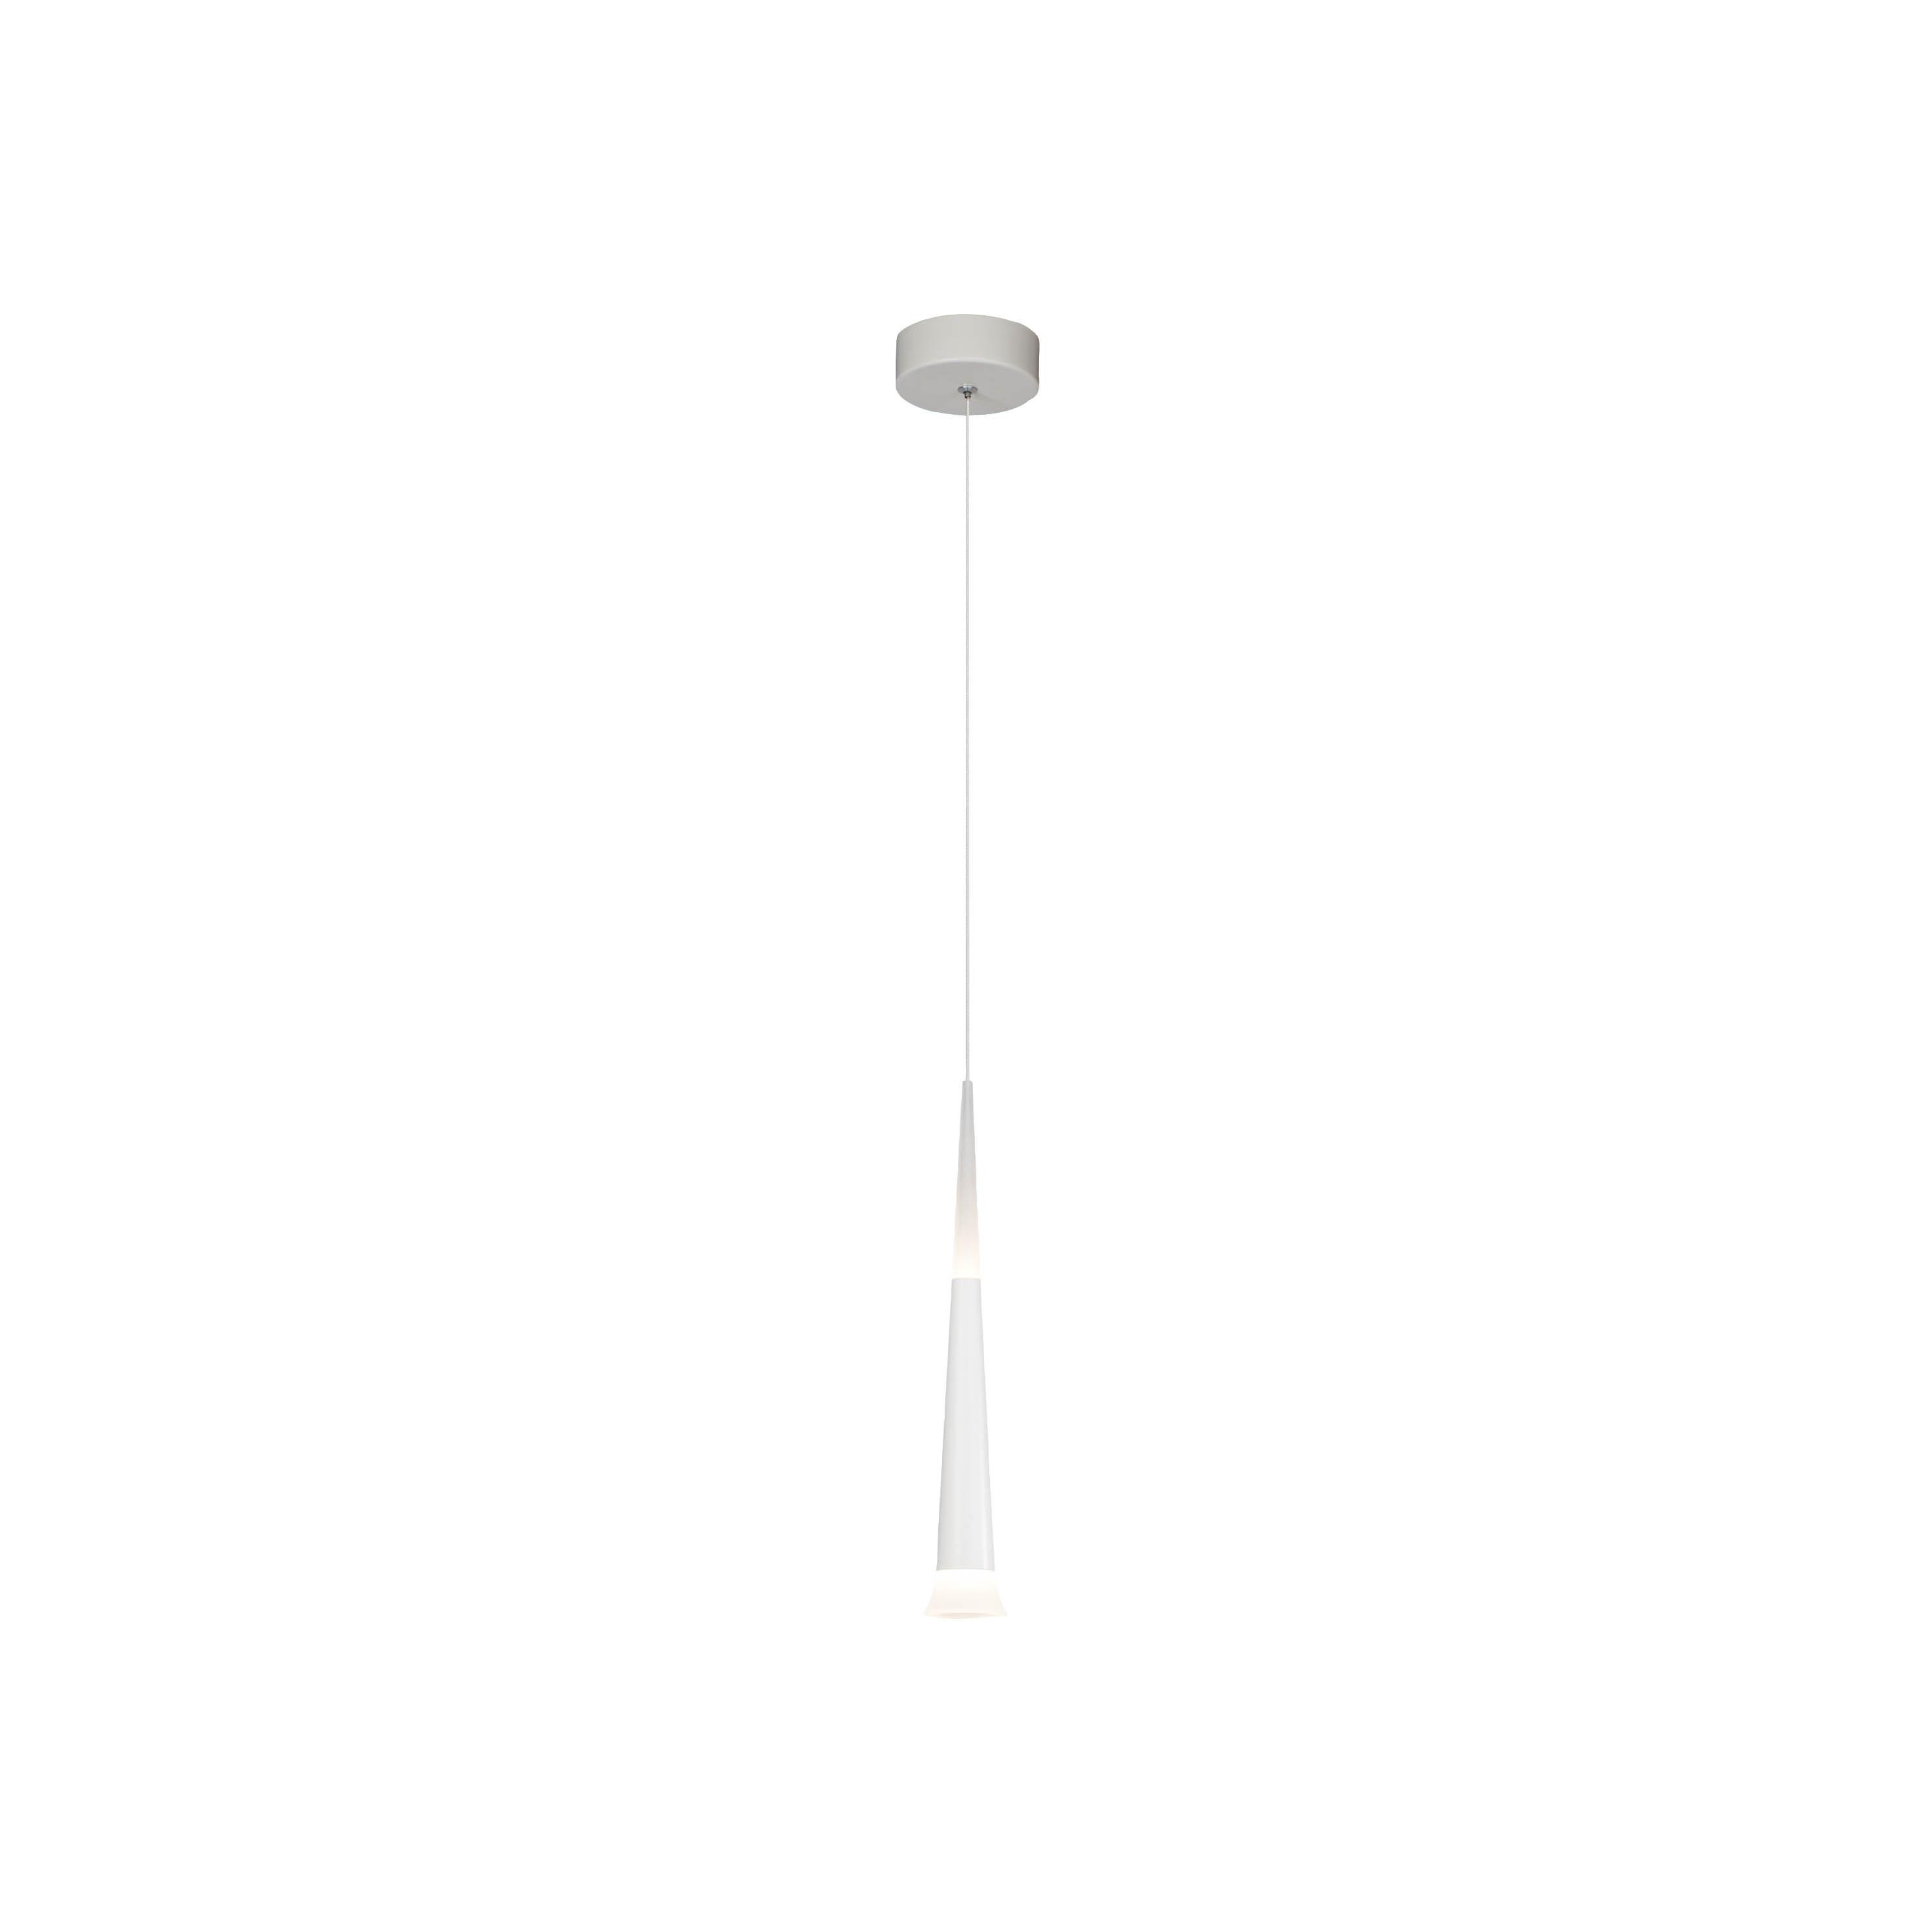 AEG Ely LED Pendelleuchte 1flg weiß